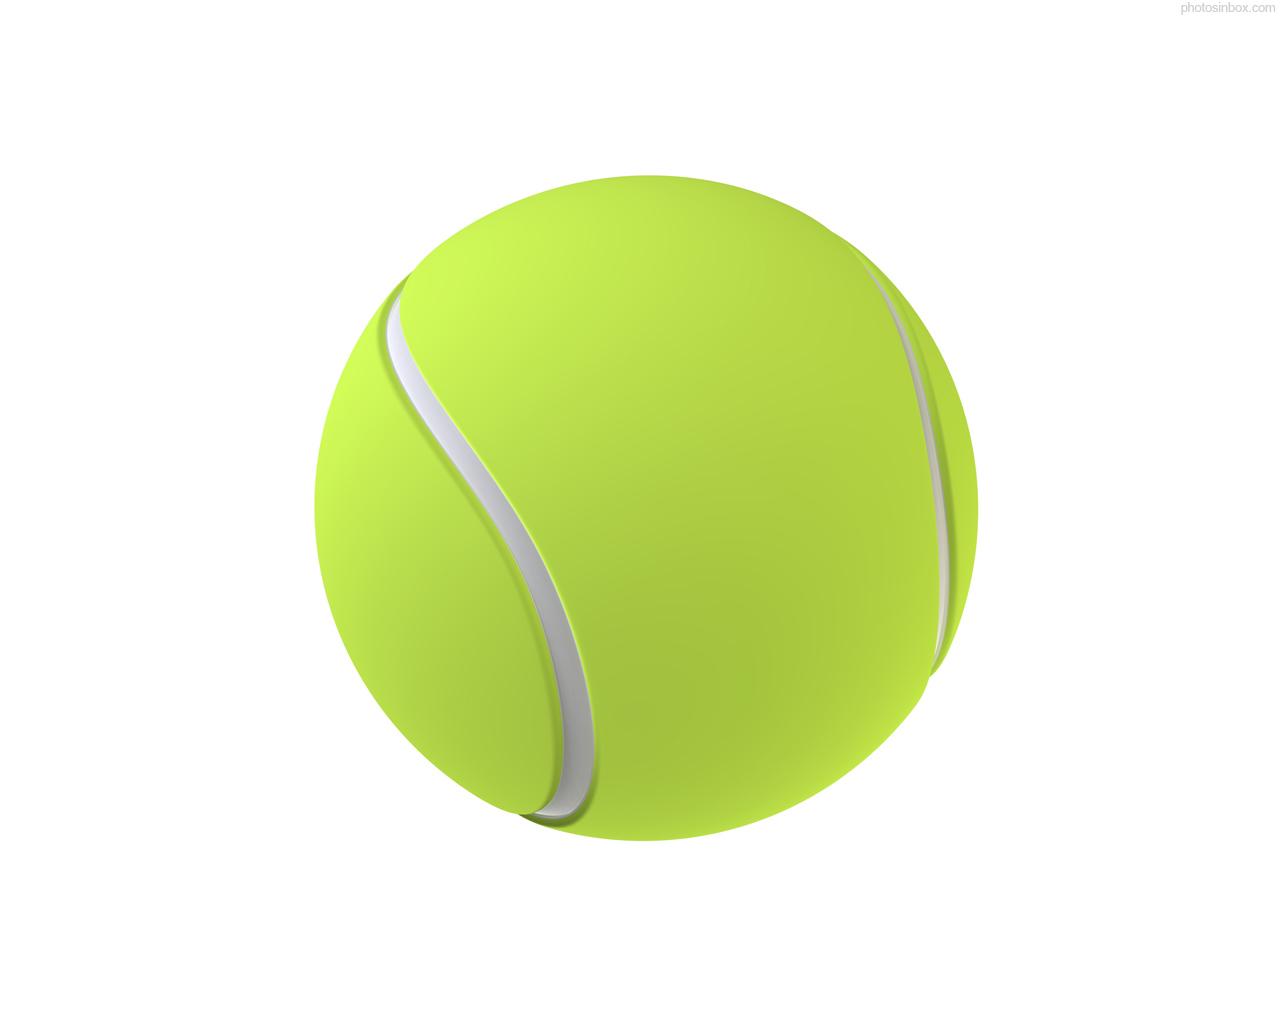 Free cliparts download clip. Ball clipart tennis ball